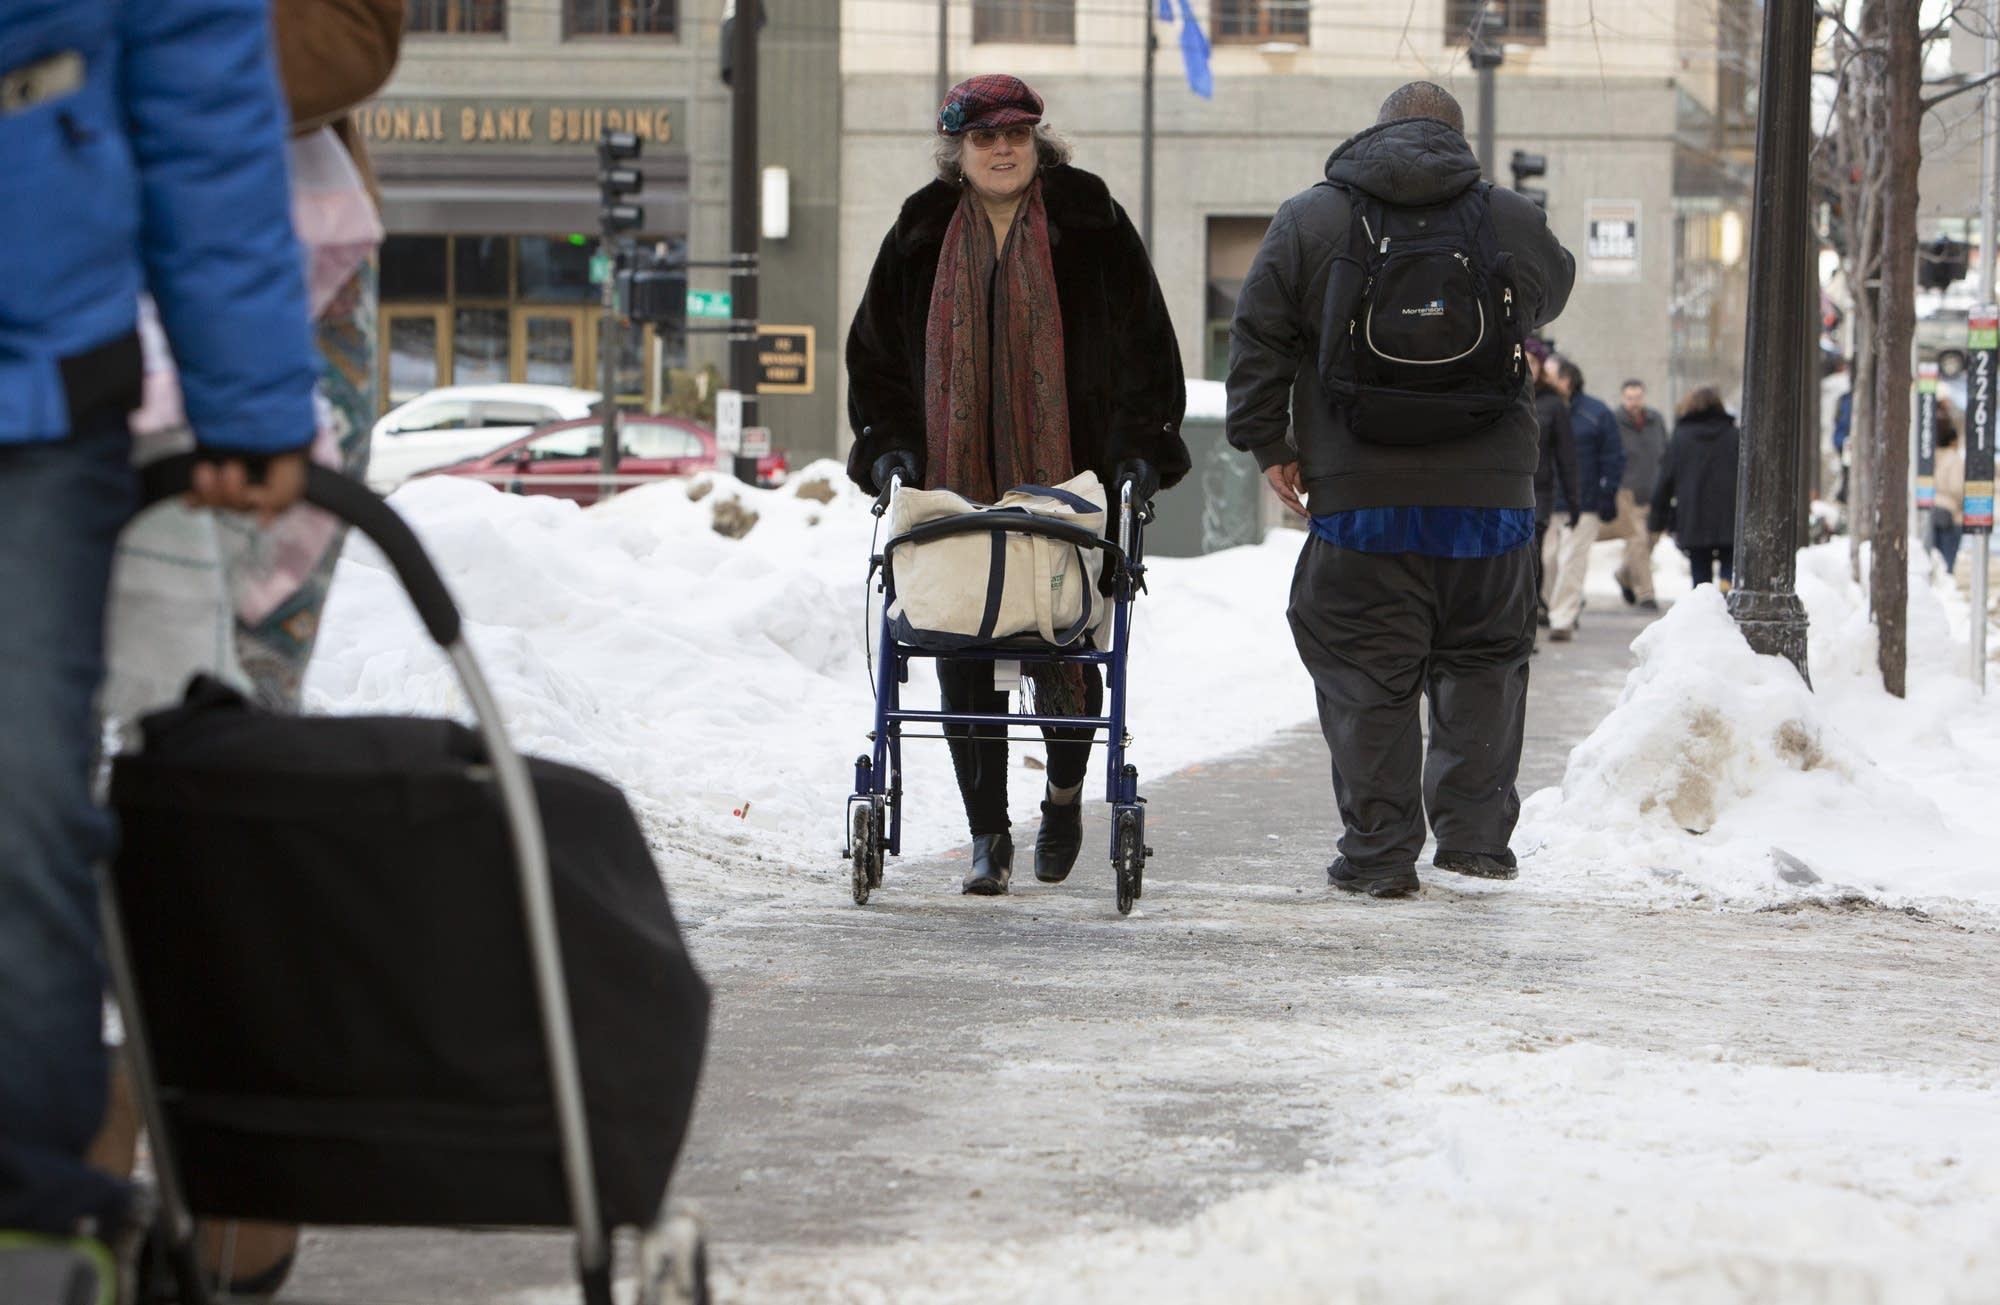 Ava McKnight makes her way down the sidewalk near Central Station